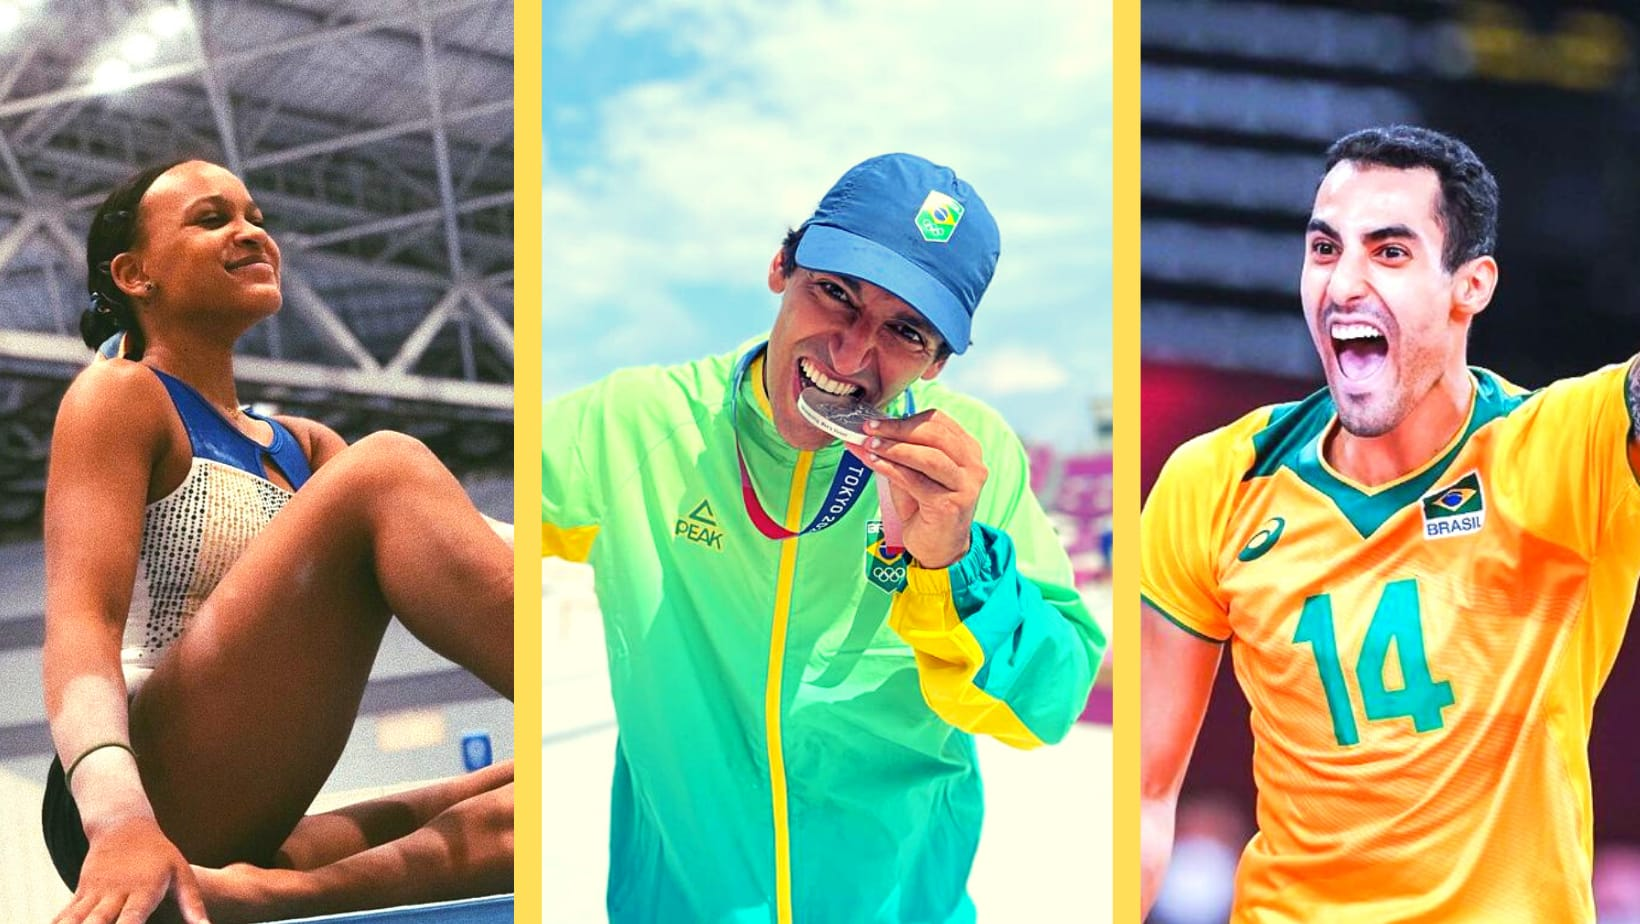 Rebeca Andrade, Kelvin Hoefler e Douglas Souza na Olimpíada